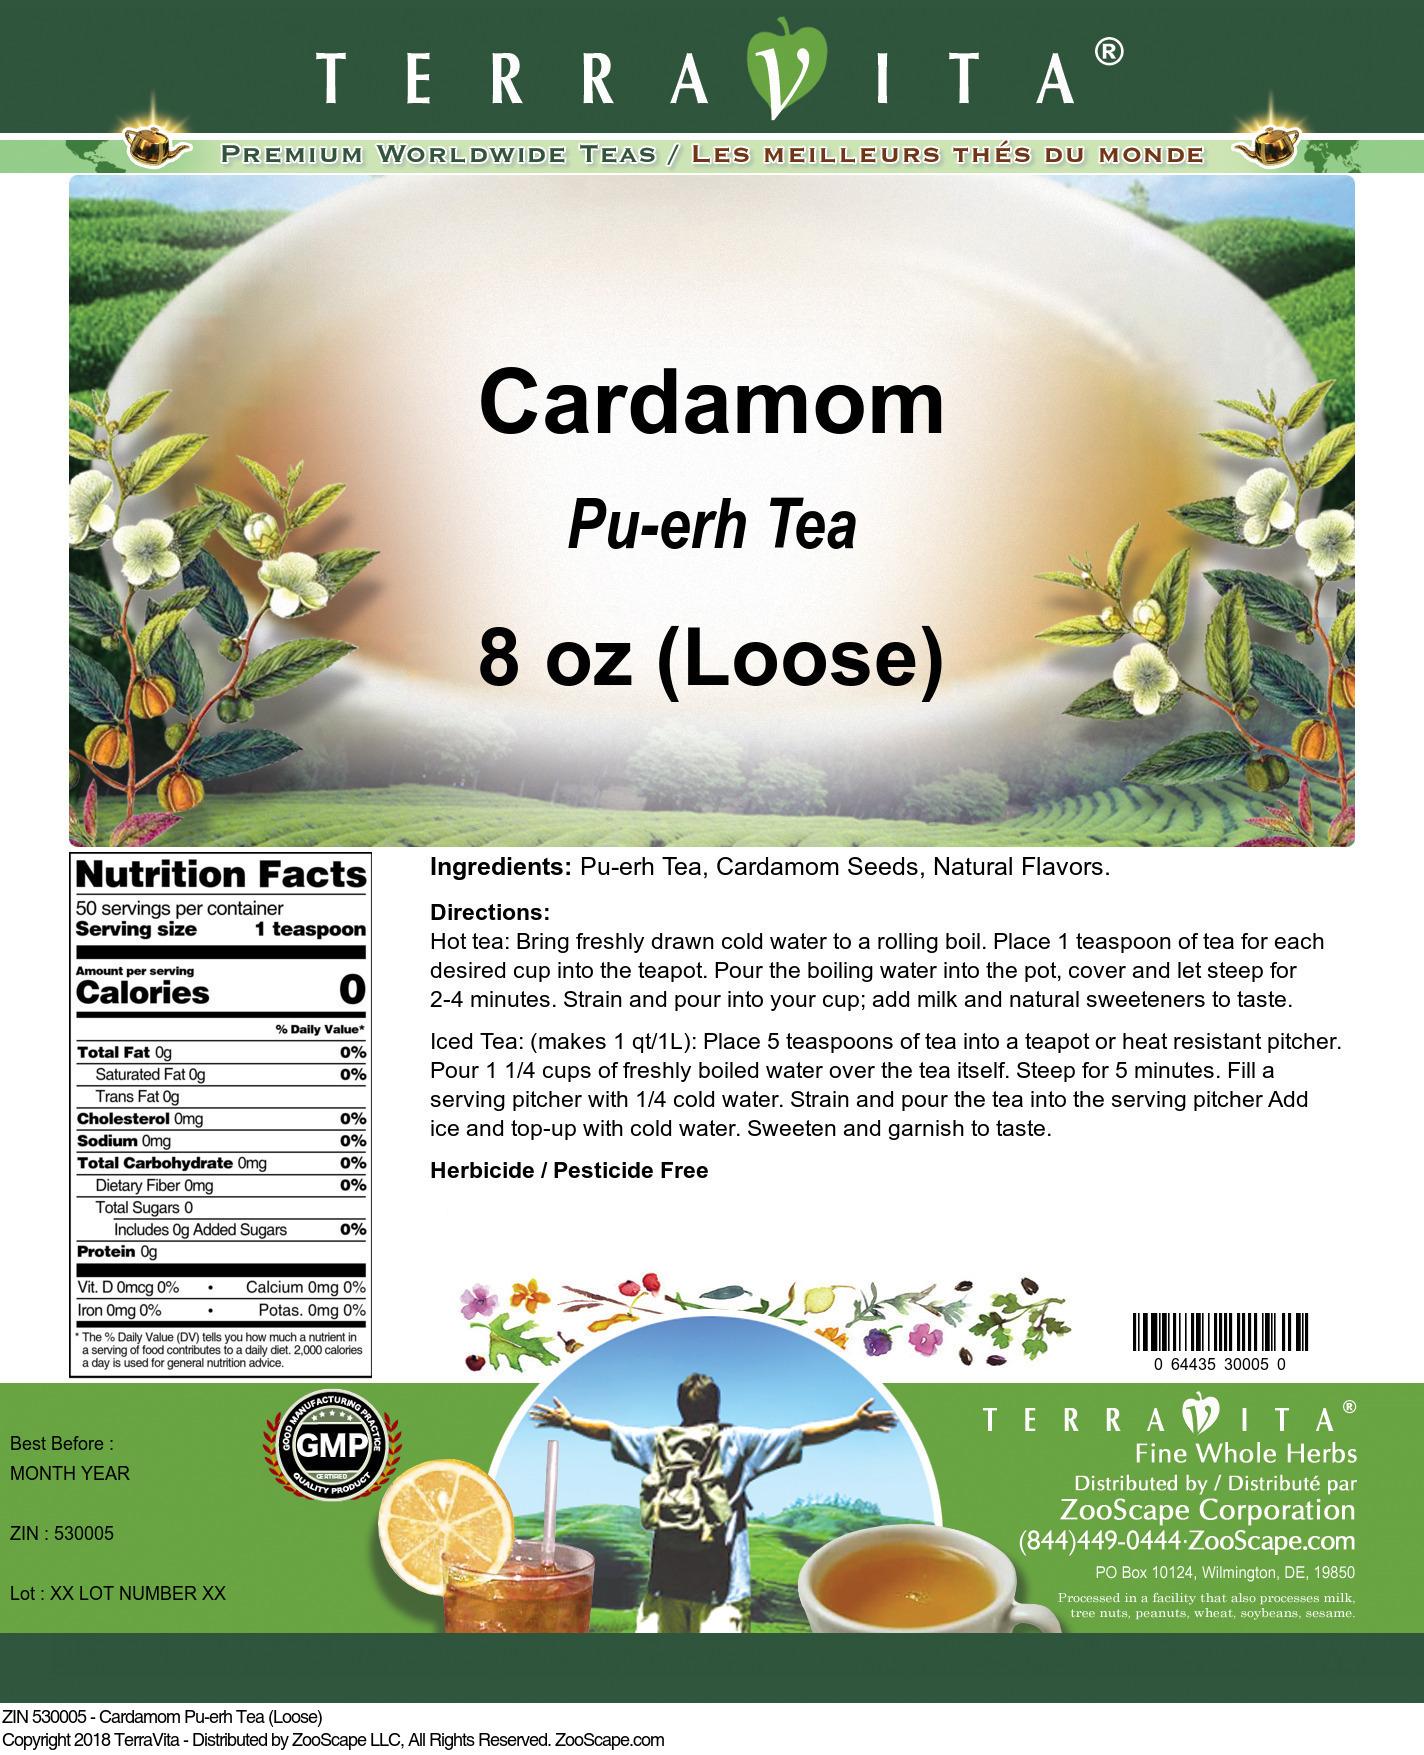 Cardamom Pu-erh Tea (Loose)